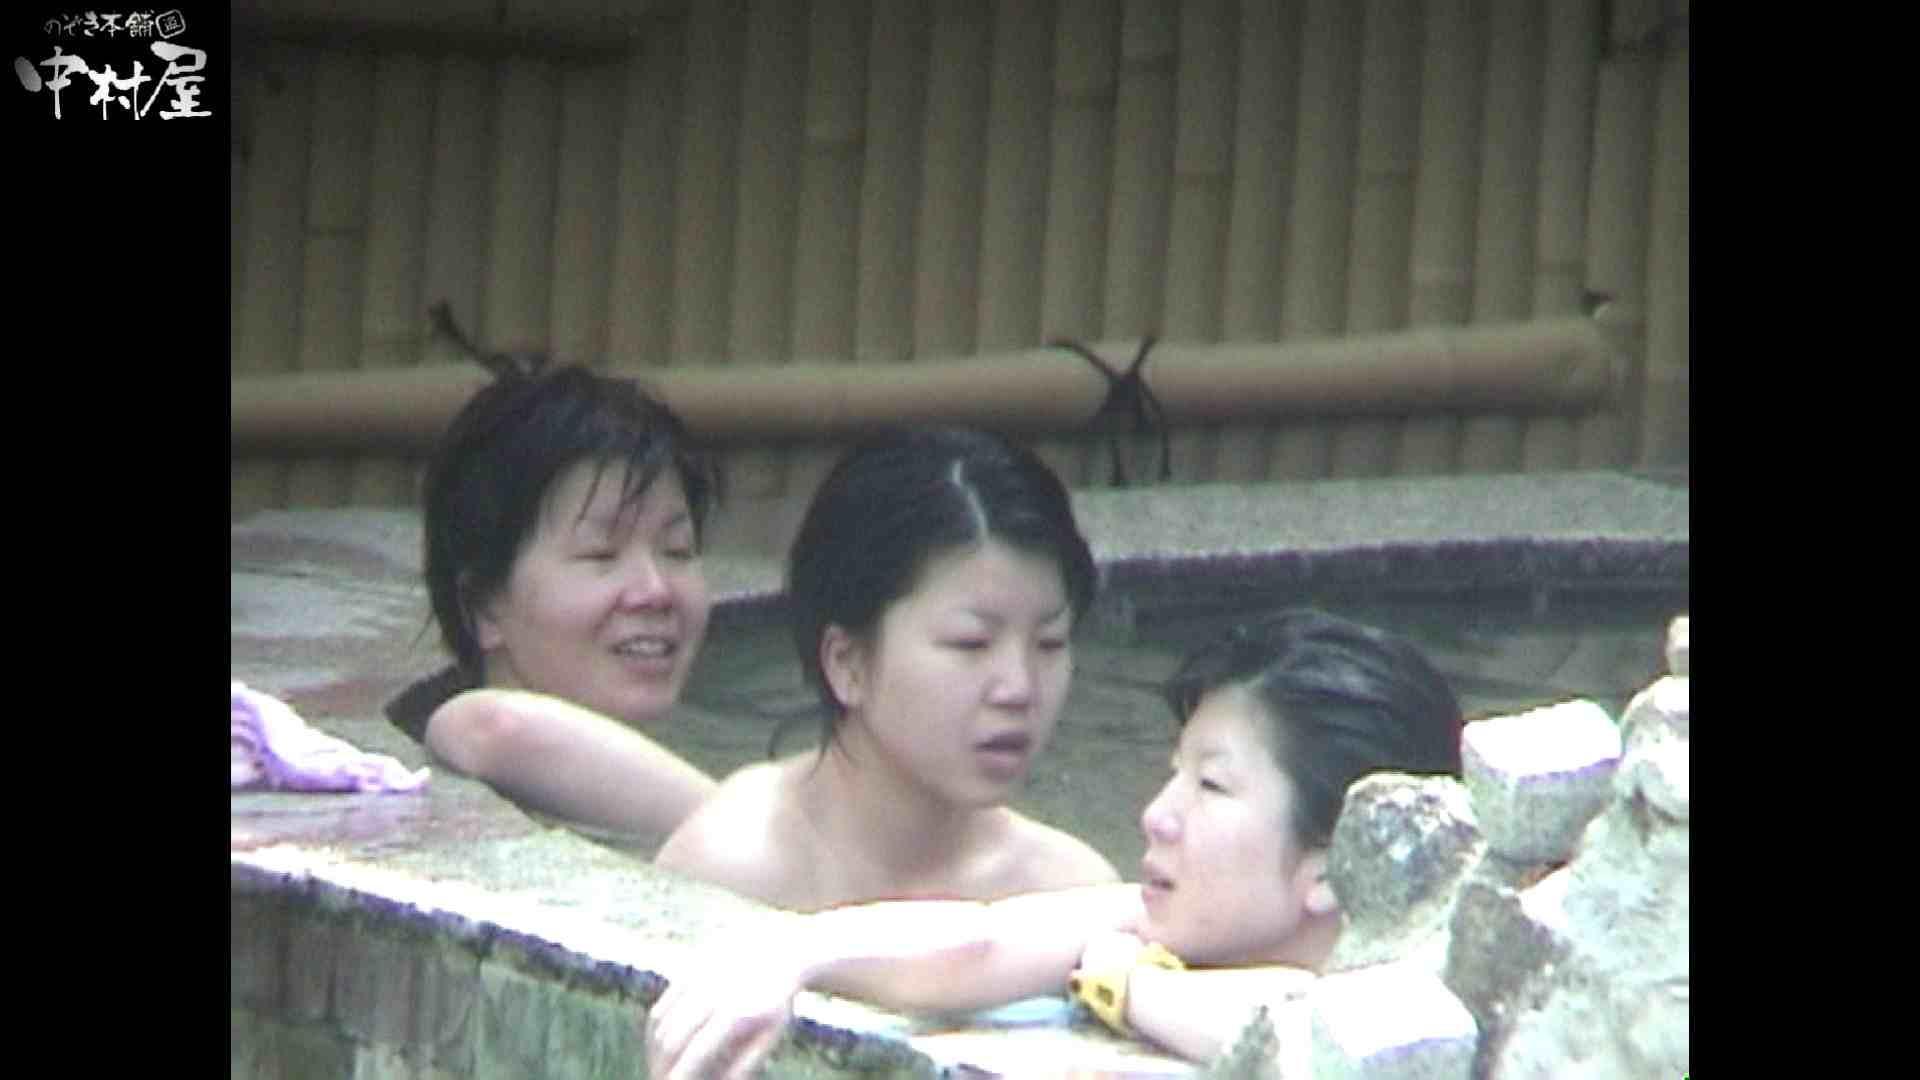 Aquaな露天風呂Vol.936 0  85連発 48